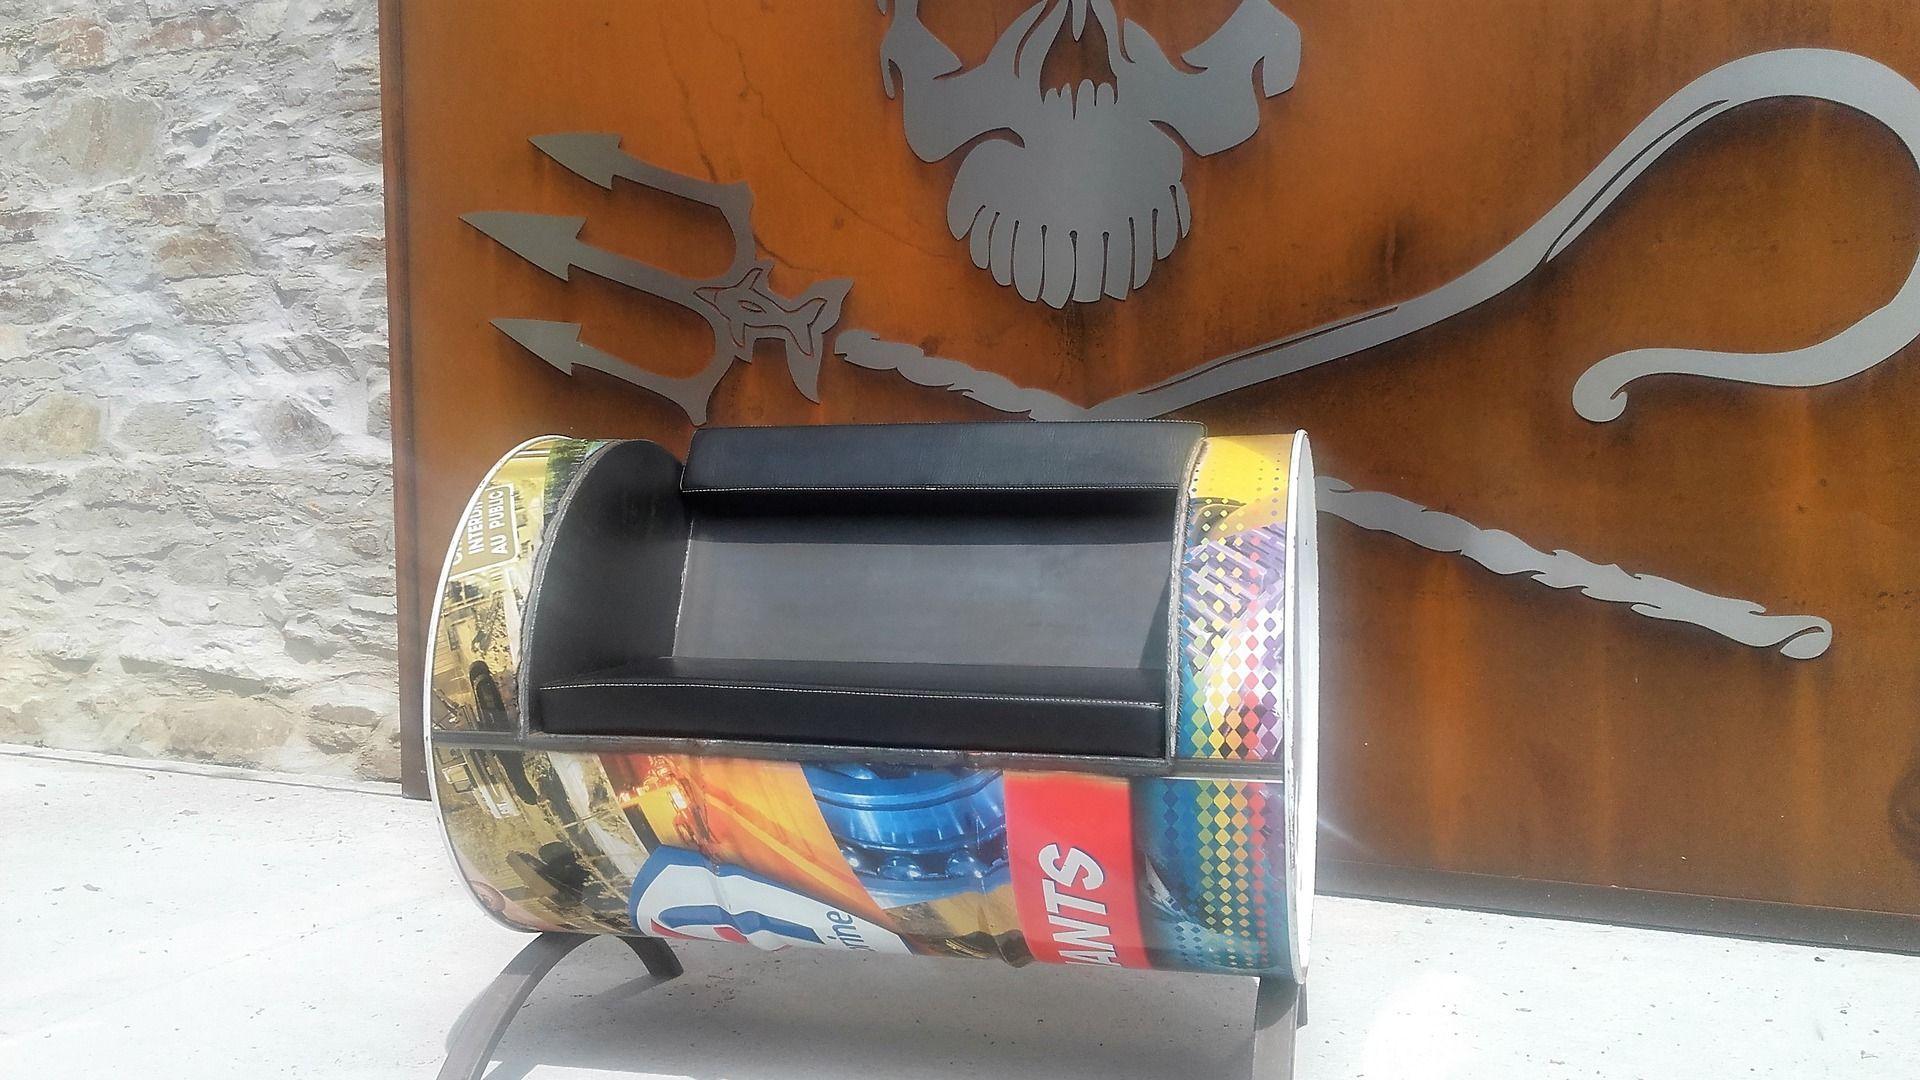 Fauteuil En M Tal De Type Industriel En Bidon Recycl Meubles Et  # Meuble En Bidon Recycle